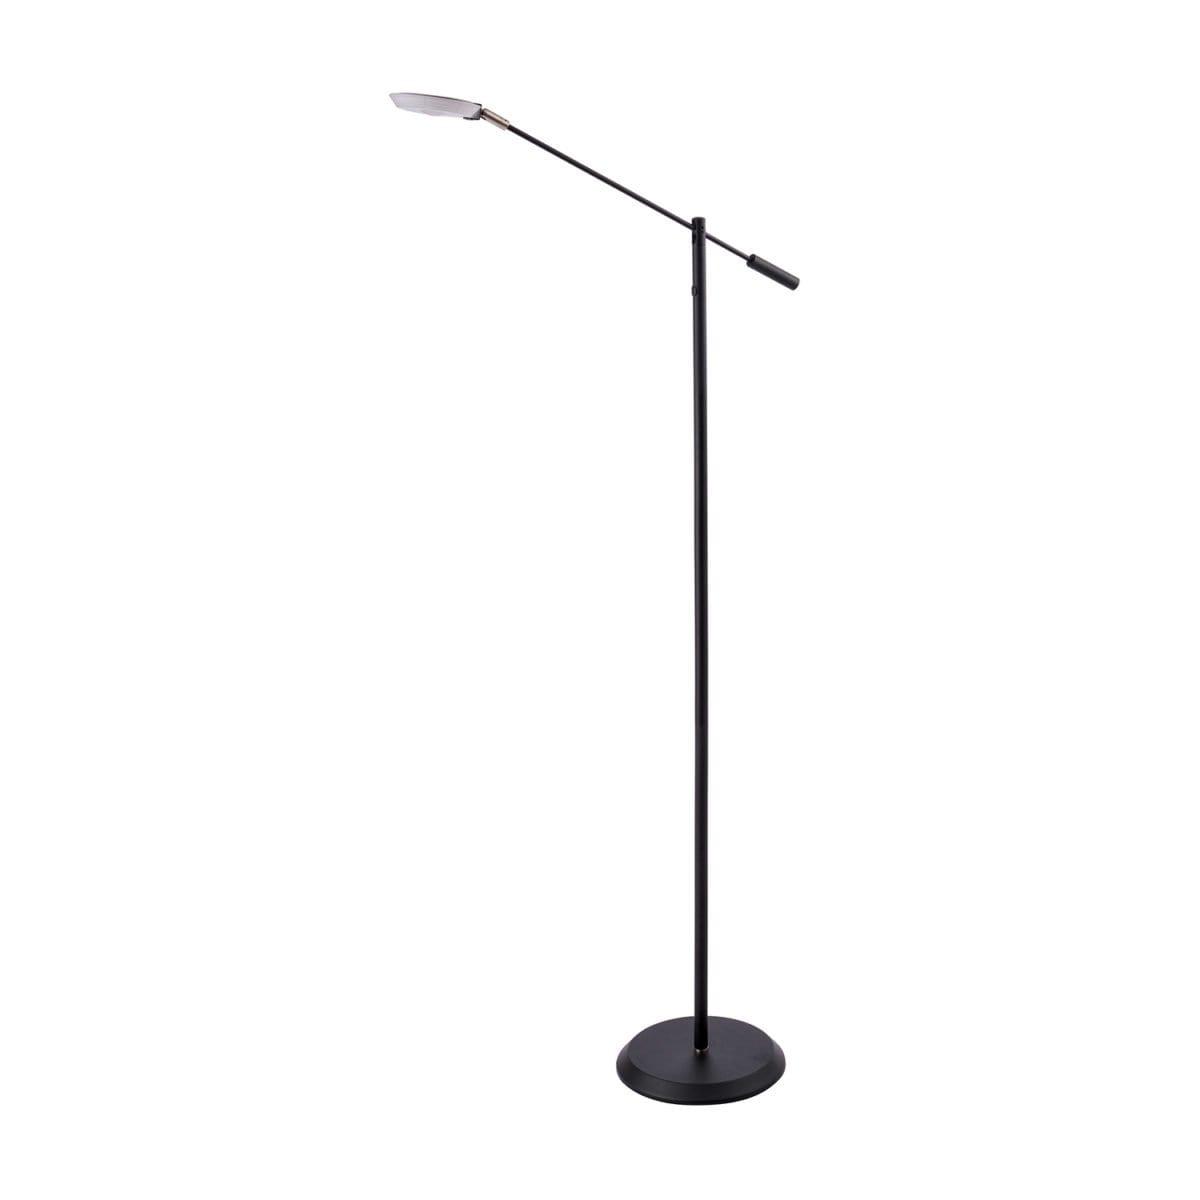 148 FL 5021 BLK LED Floor Lamp in Black or Satin Nickle Regular Price $189.99 Sale Price $132.99